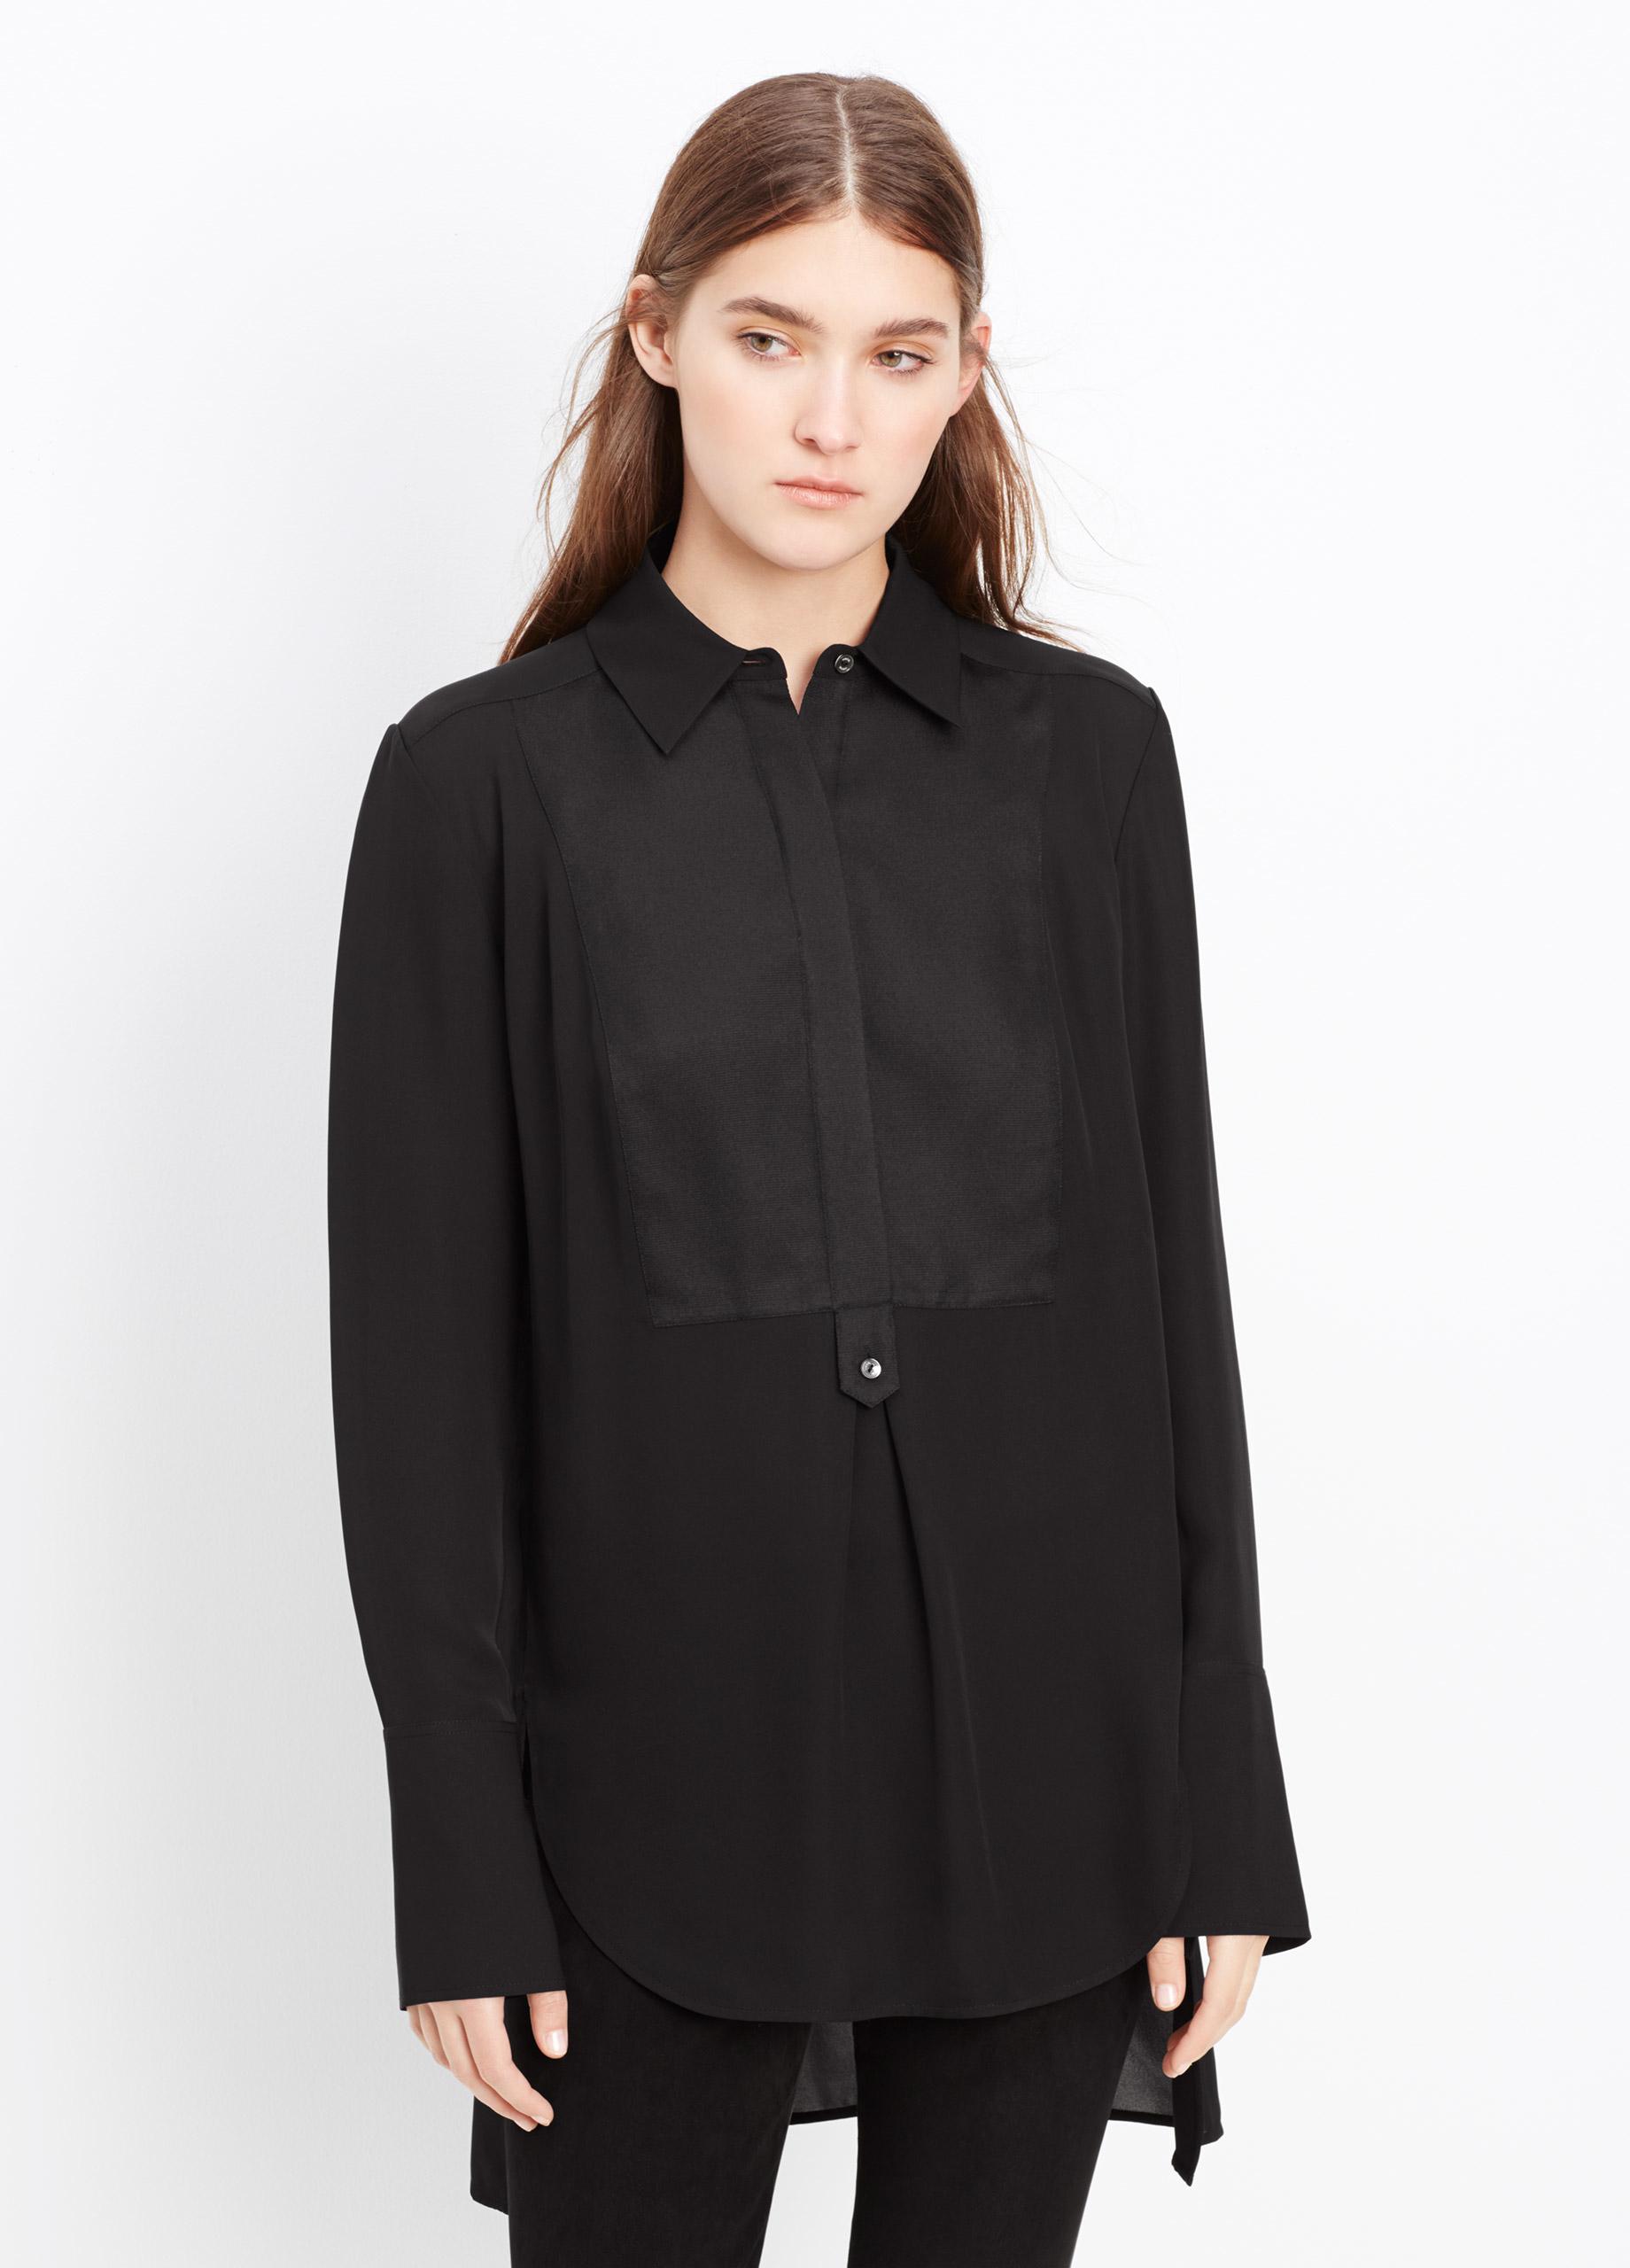 Women'S Tuxedo Blouse 107